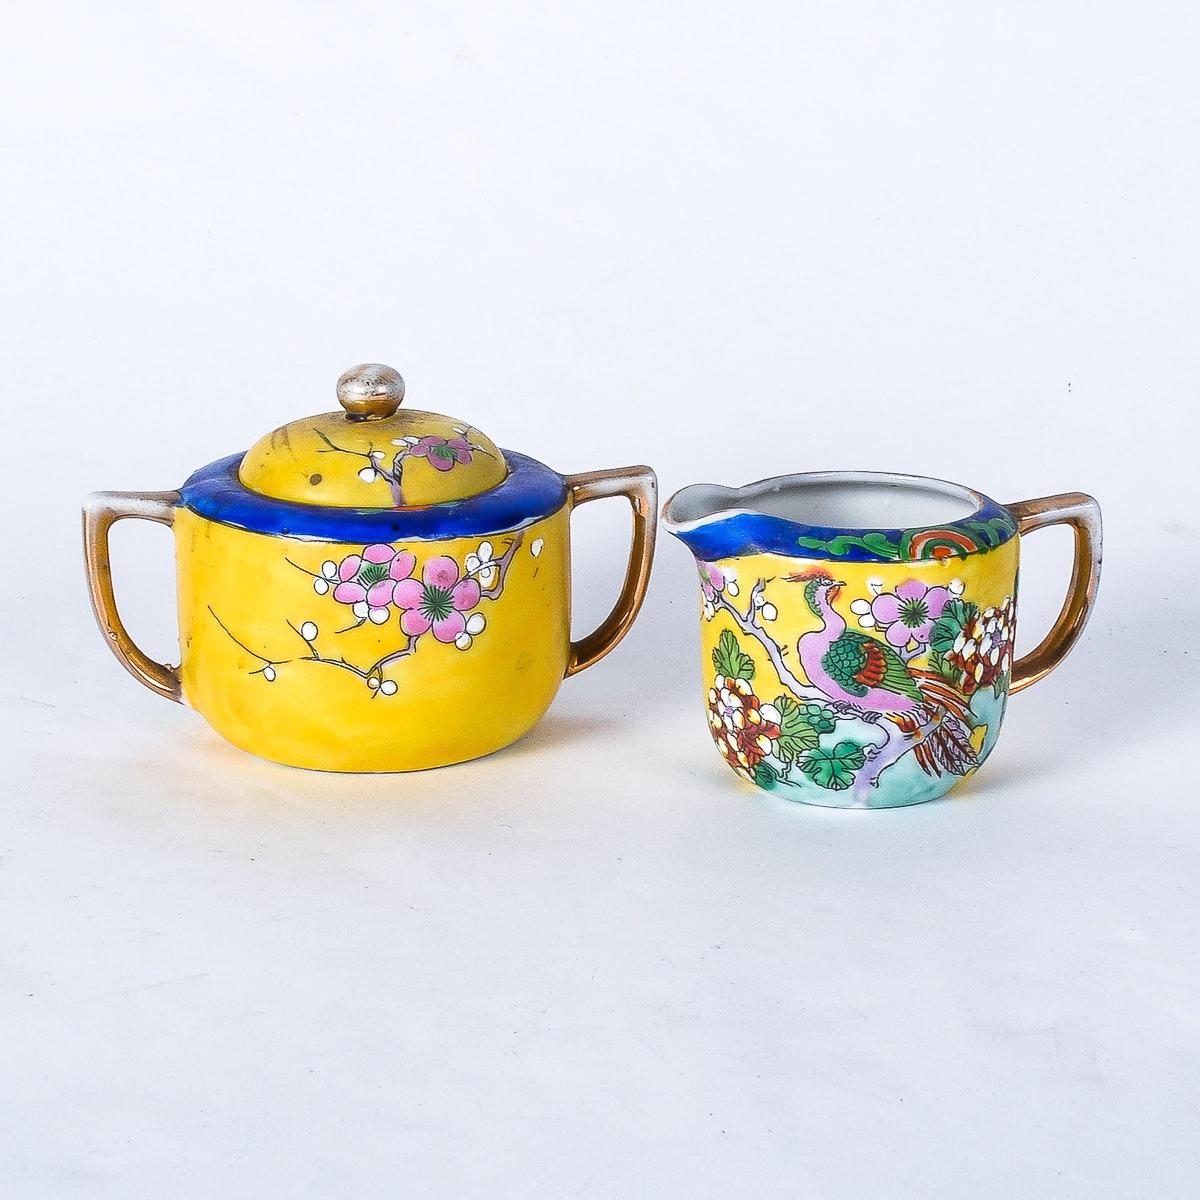 Japanese Porcelain Creamer and Sugar Bowl Set